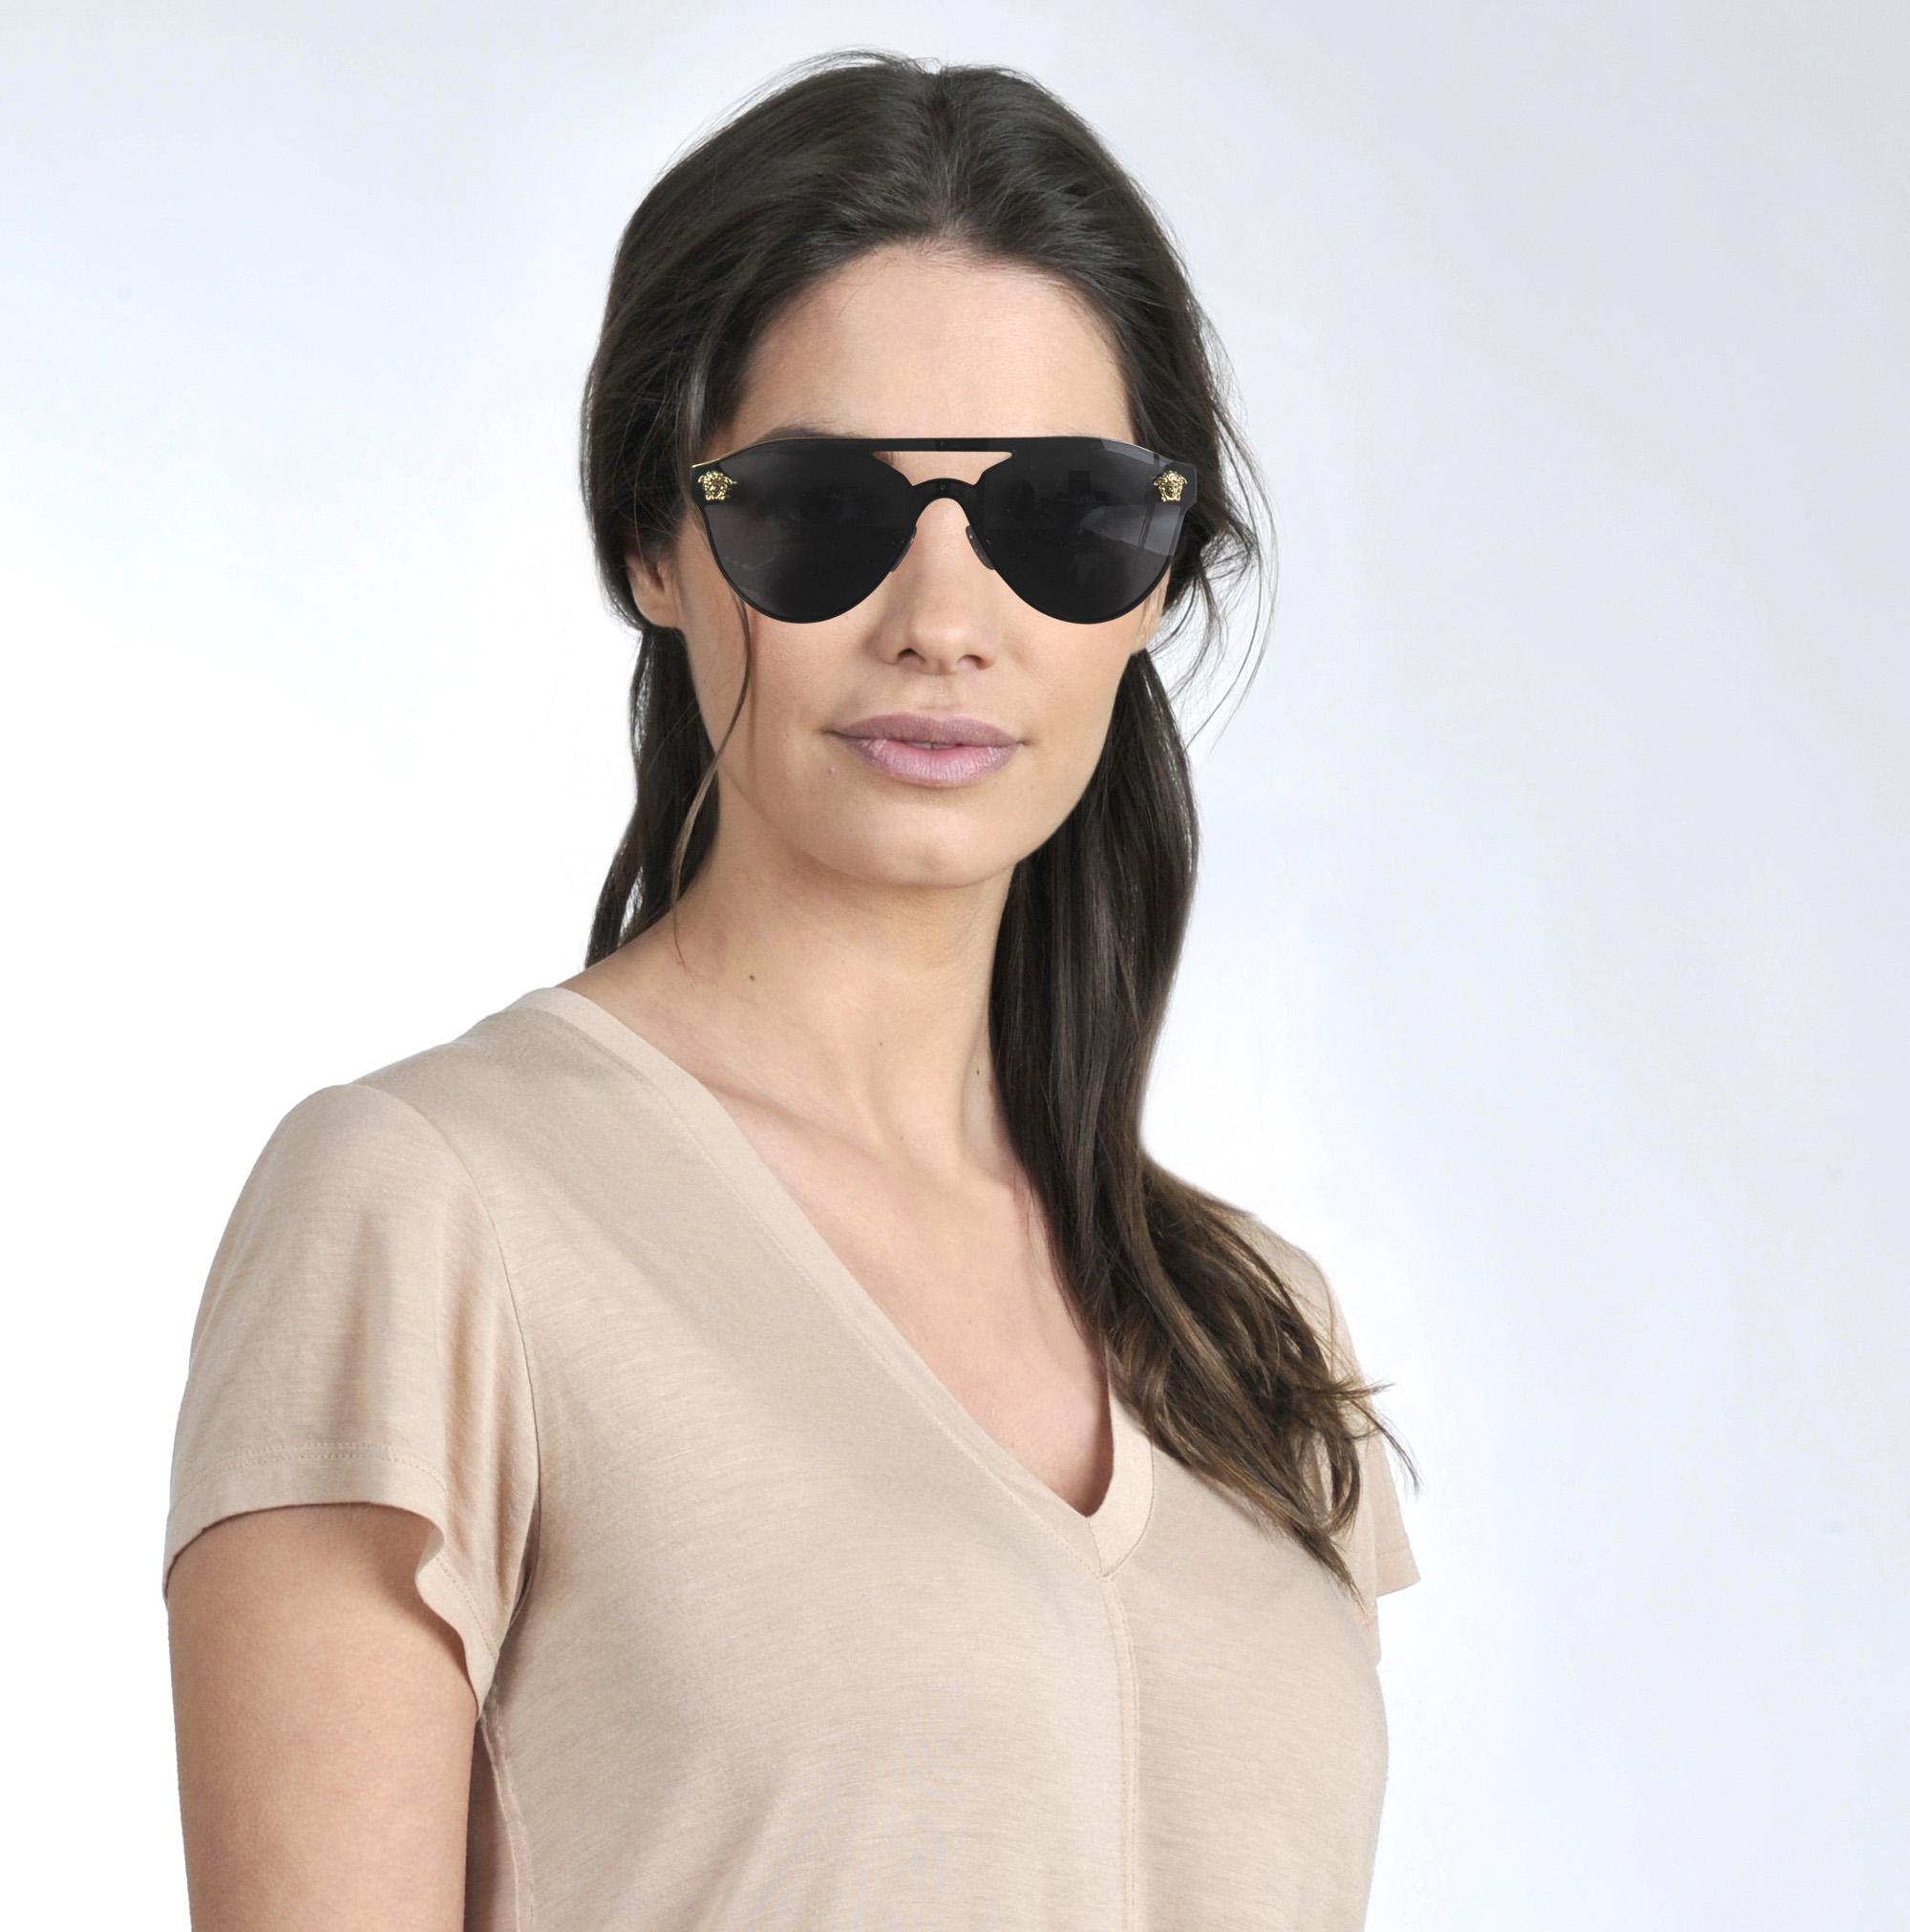 a7e1fb770a Lyst - Versace Glam Medusa Sunglasses In Black Metal